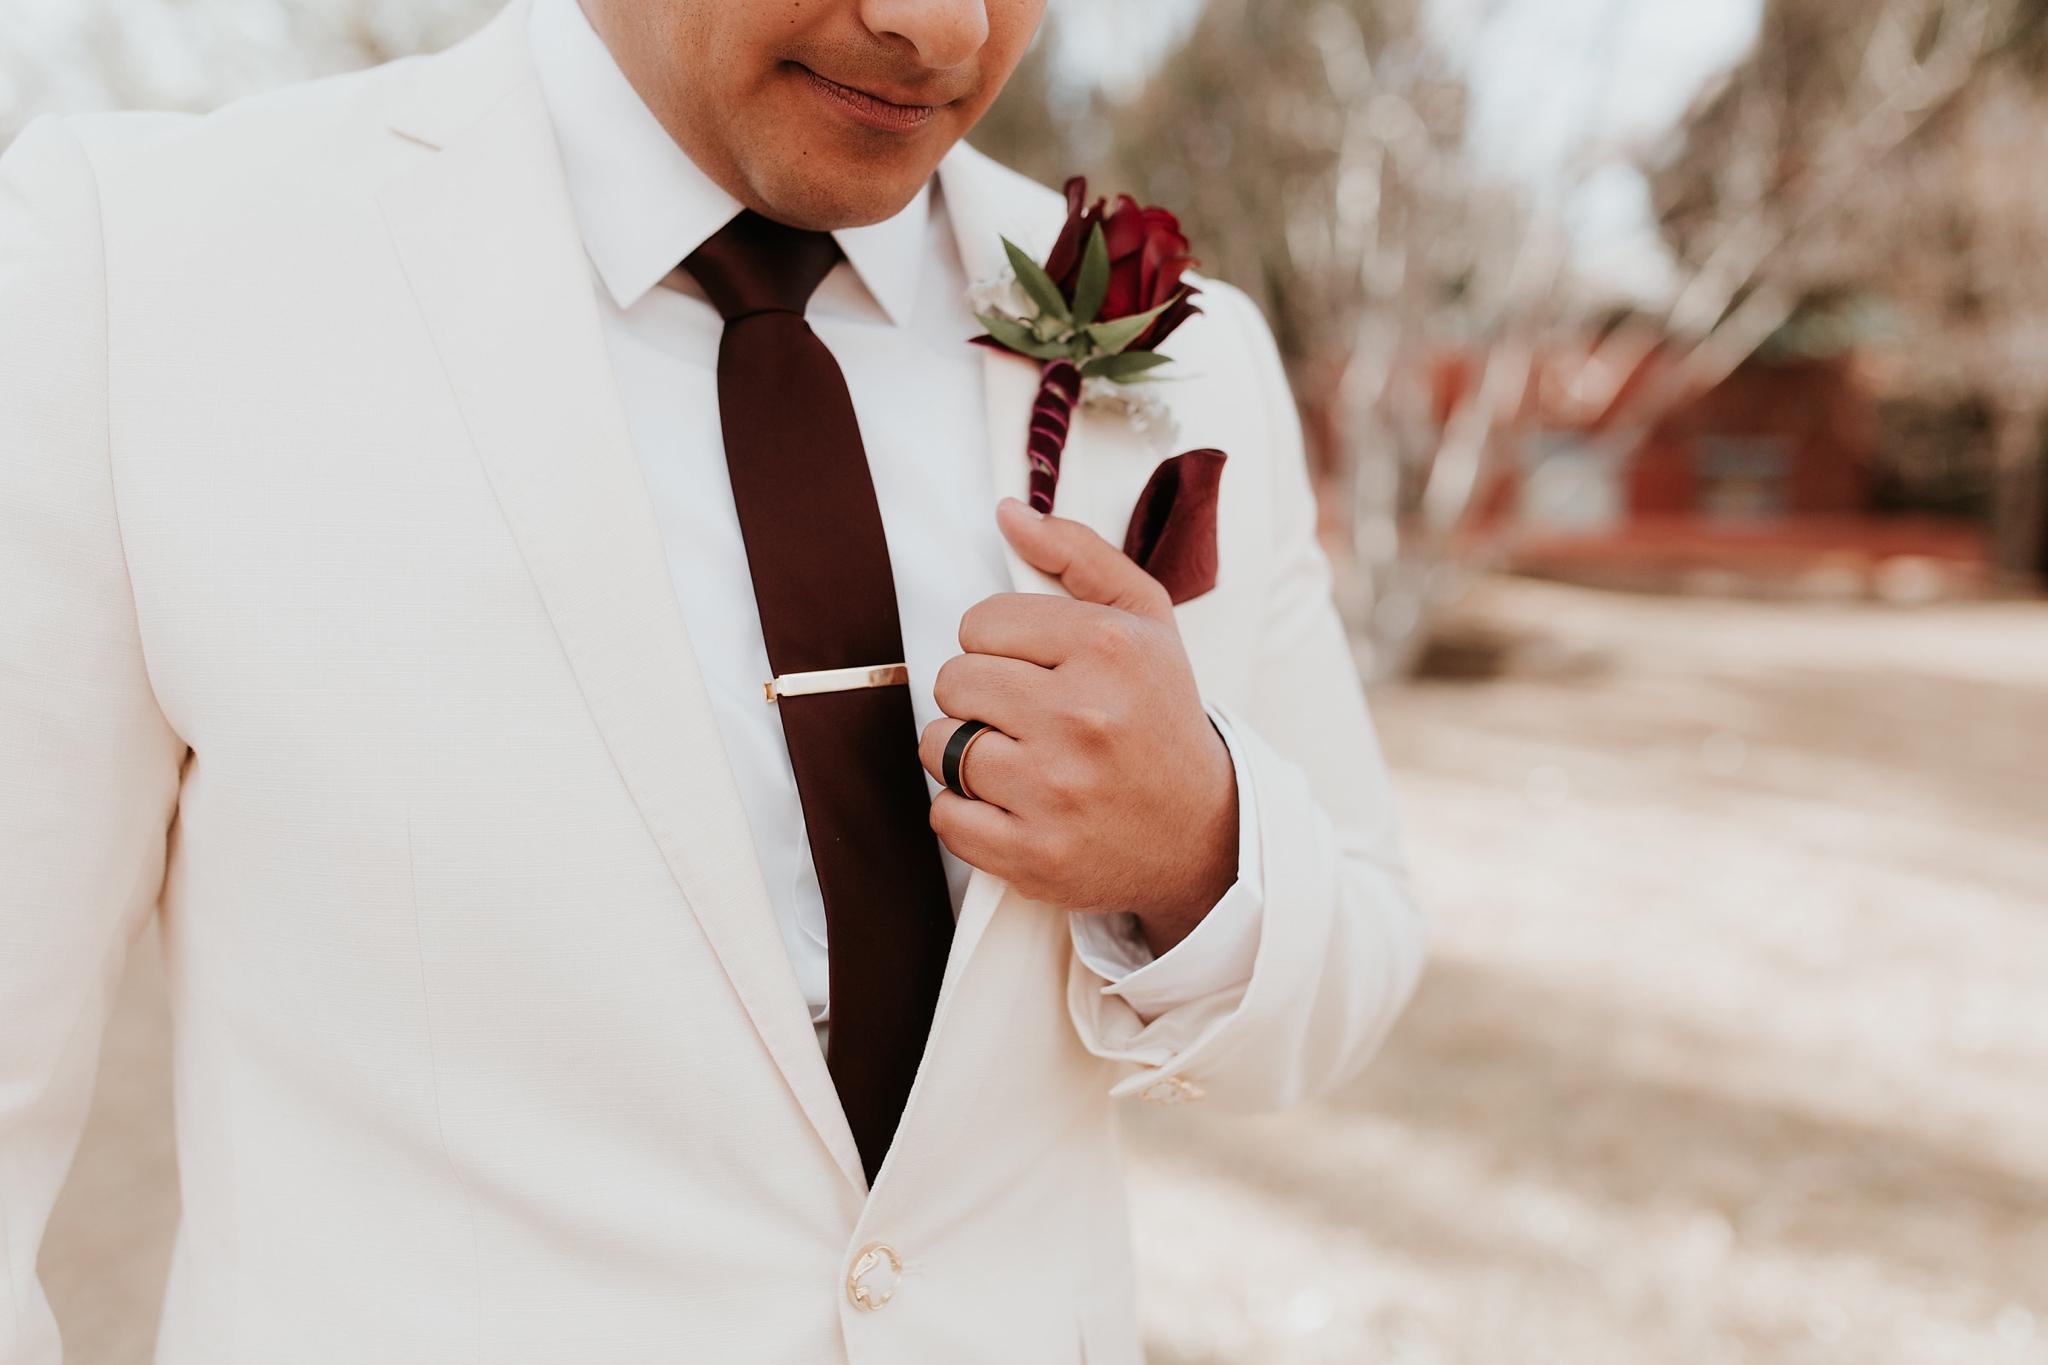 Alicia+lucia+photography+-+albuquerque+wedding+photographer+-+santa+fe+wedding+photography+-+new+mexico+wedding+photographer+-+new+mexico+wedding+-+wedding+-+groom+-+groom+style+-+wedding+style_0092.jpg